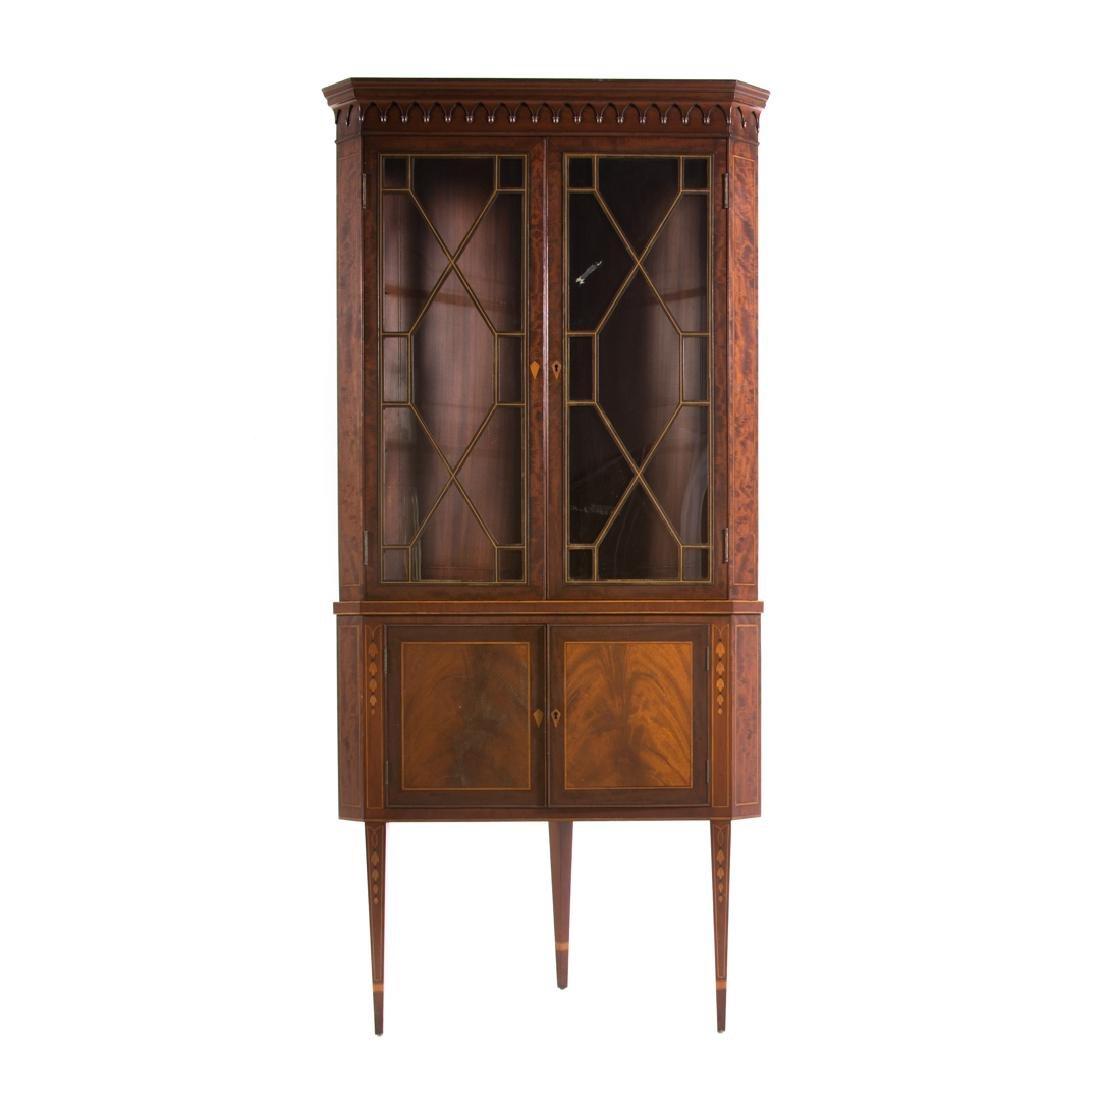 Federal style inlaid mahogany corner cabinet